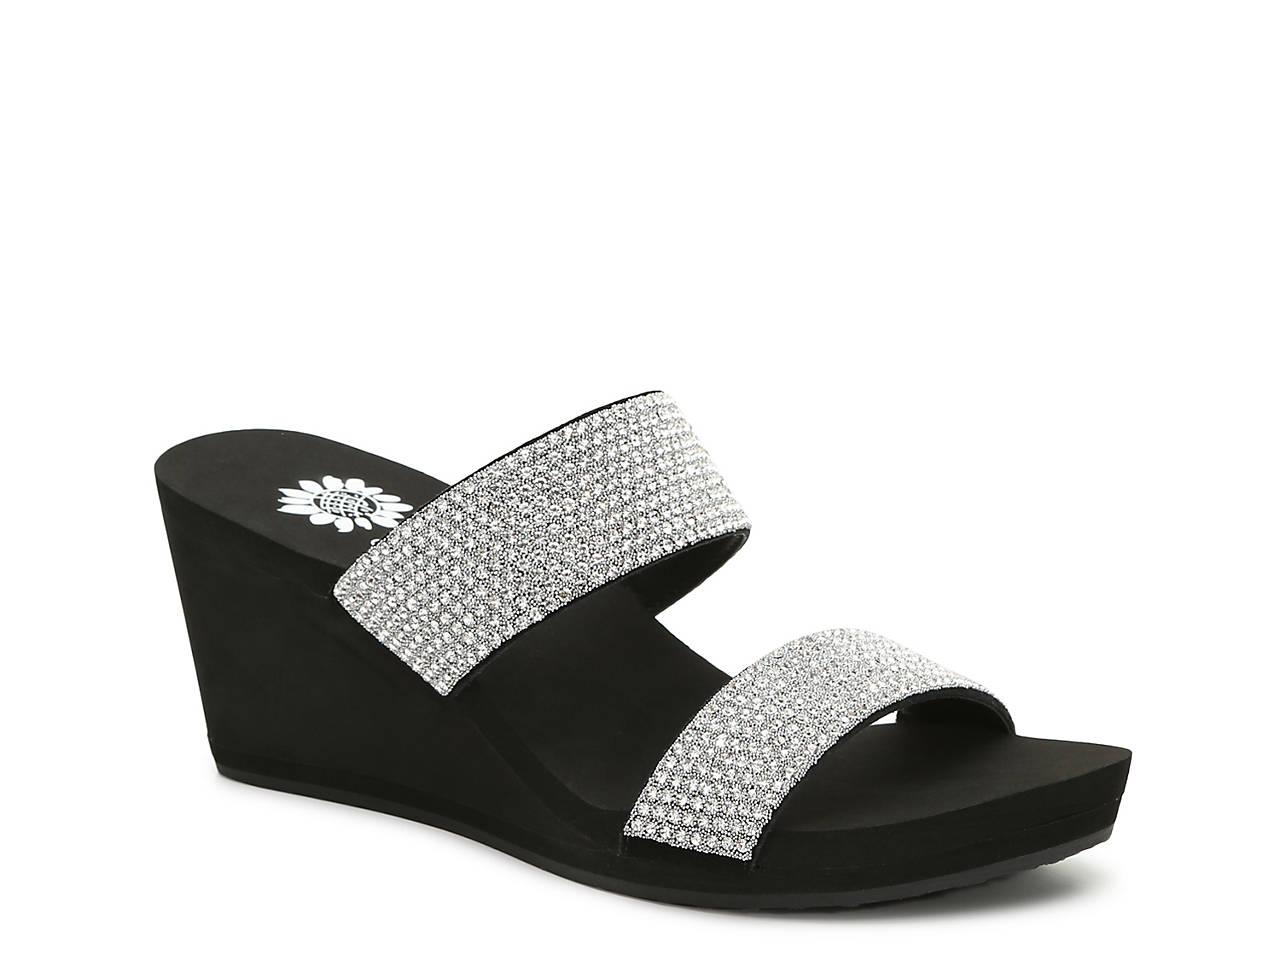 edd045eb5297 Yellow Box Frisky Wedge Sandal Women s Shoes